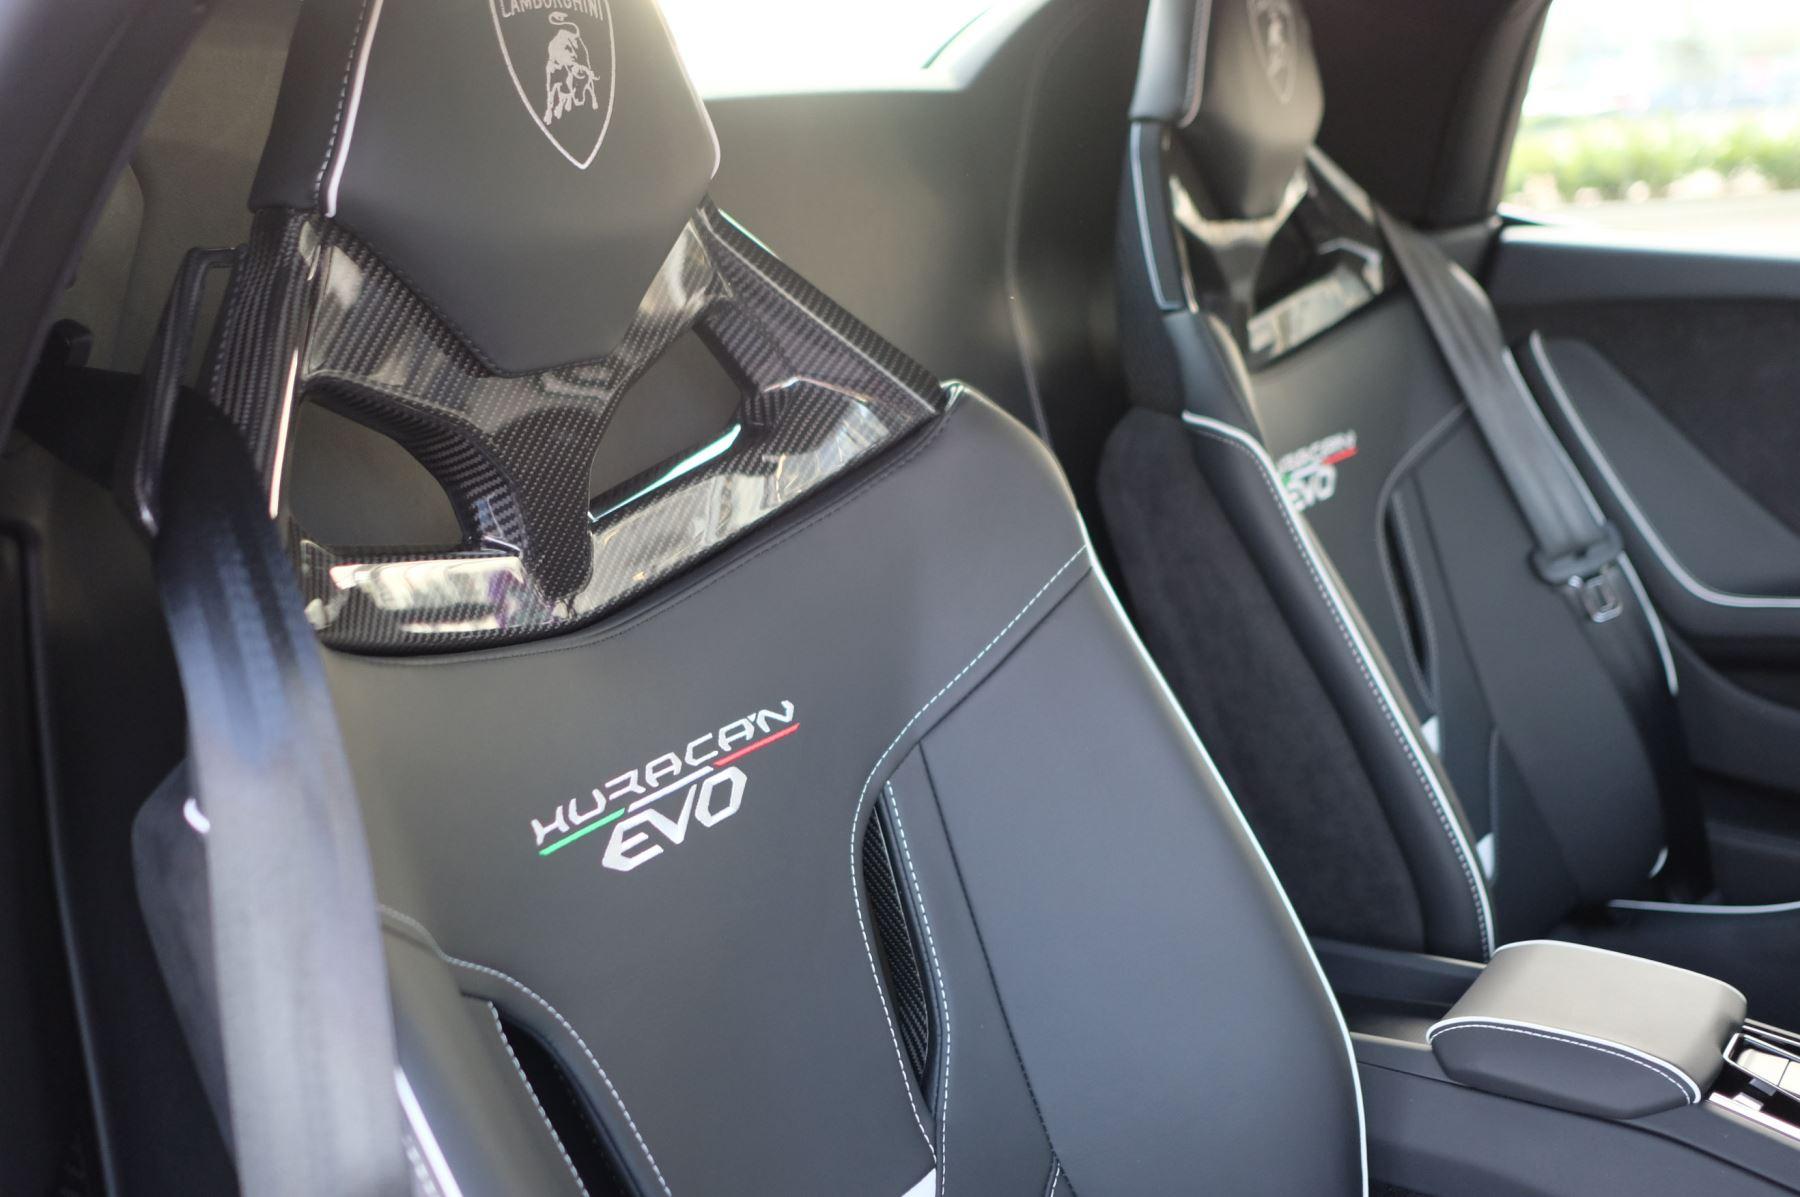 Lamborghini Huracan EVO Spyder 5.2 V10 640 2dr Auto AWD image 25